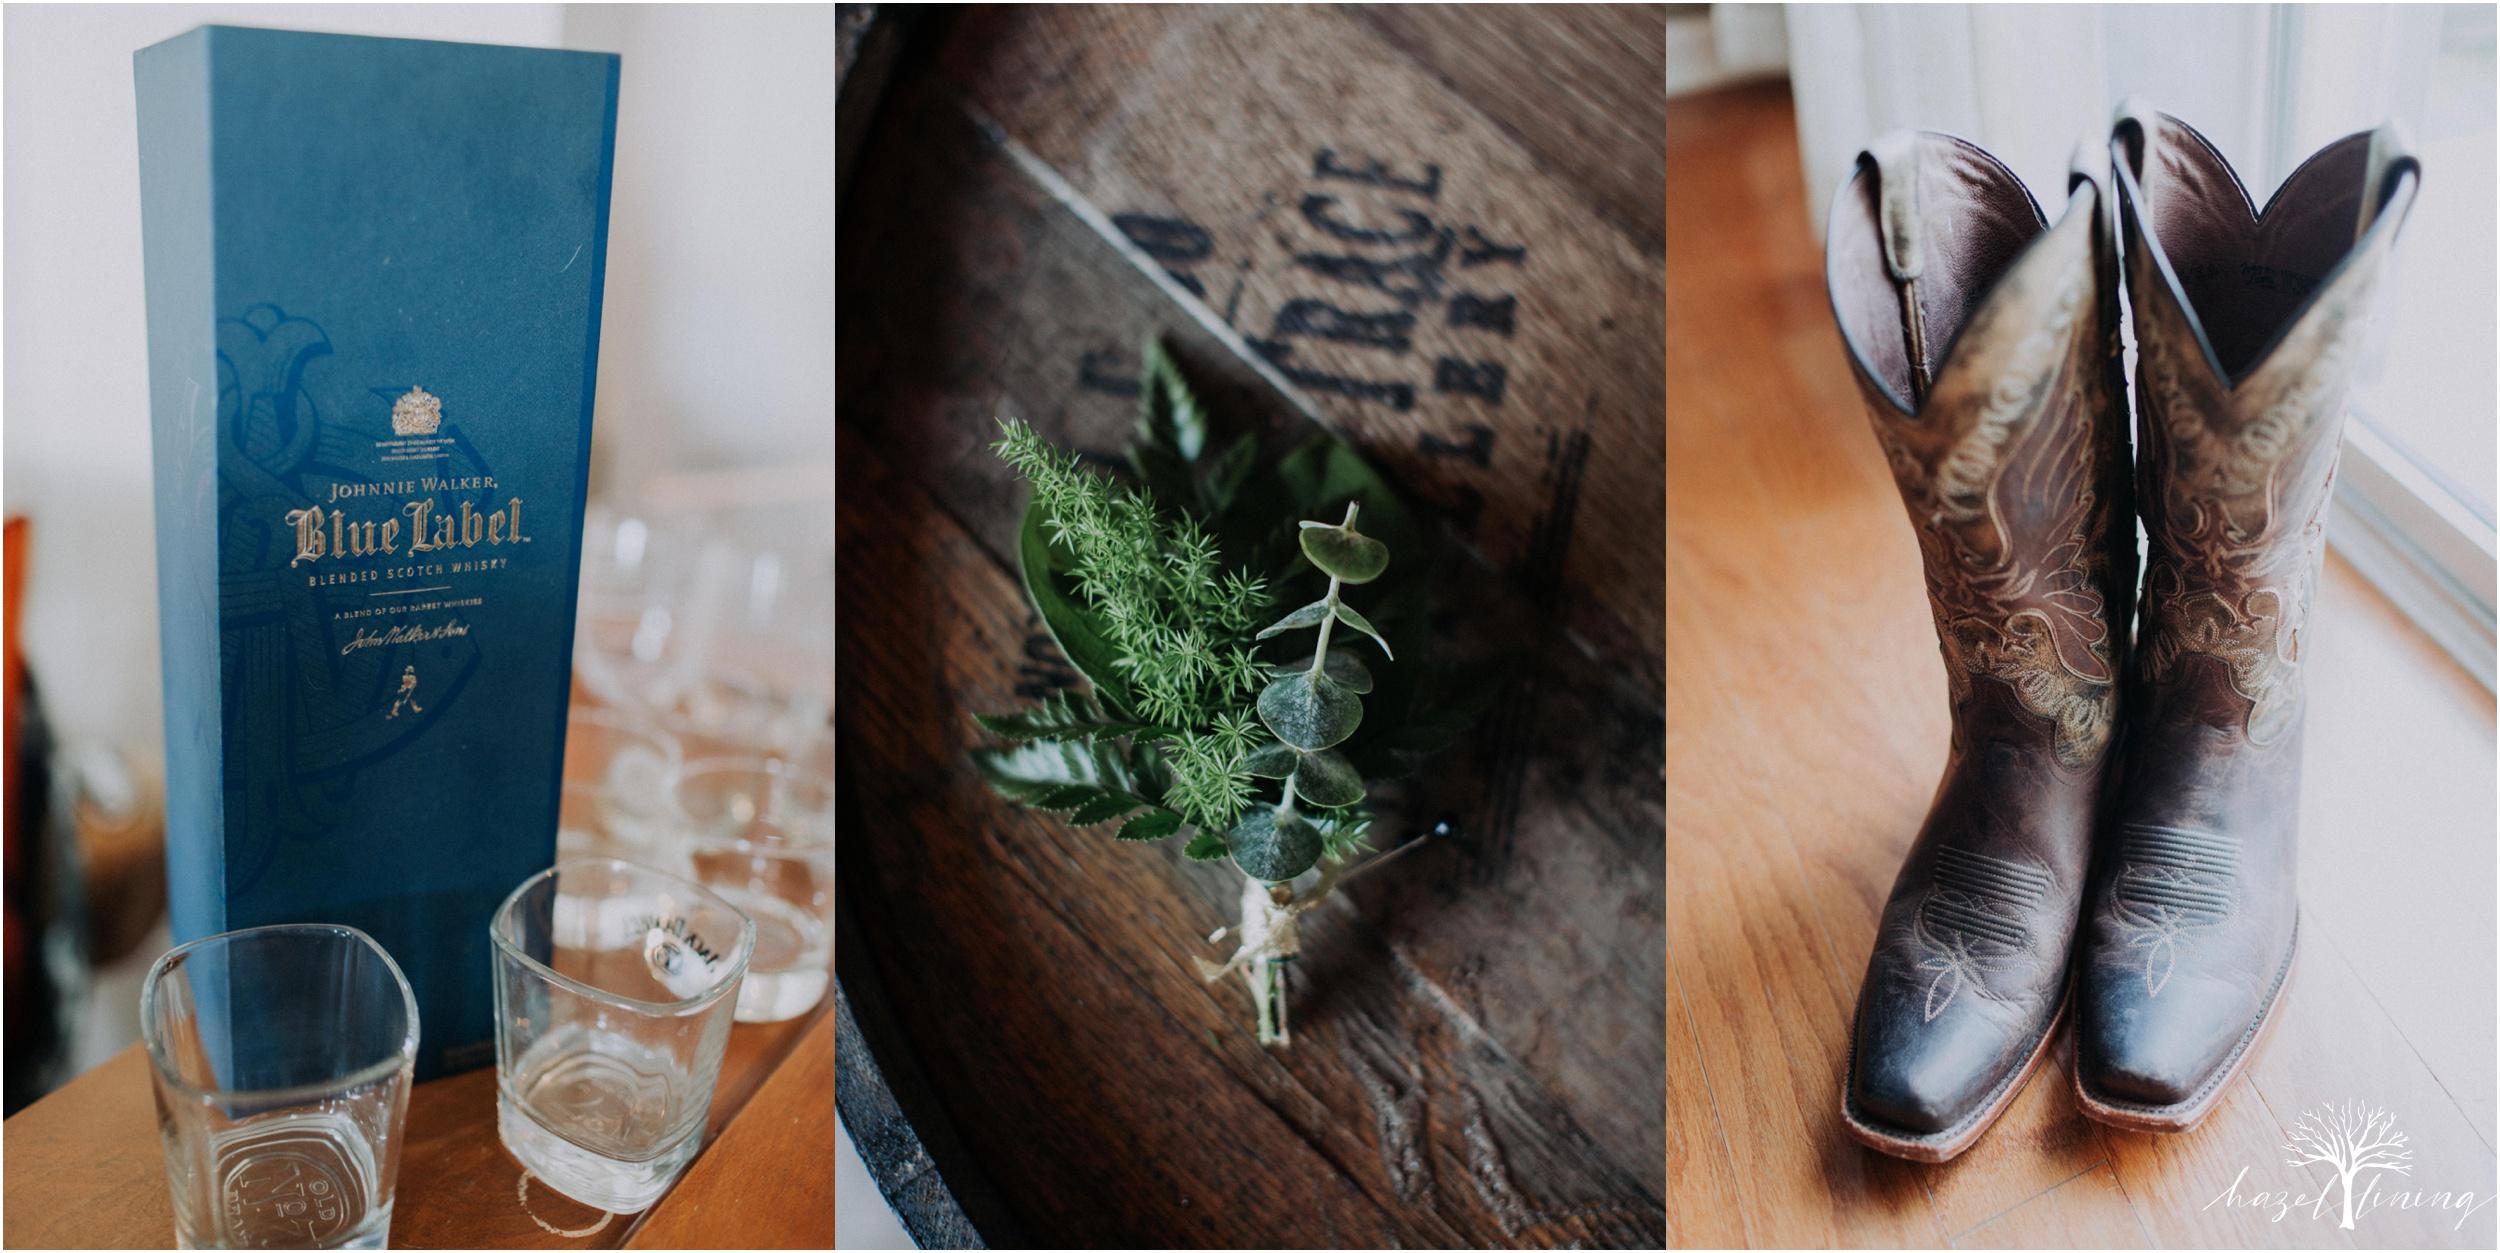 hazel-lining-travel-wedding-elopement-photography-lisa-landon-shoemaker-the-farm-bakery-and-events-bucks-county-quakertown-pennsylvania-summer-country-outdoor-farm-wedding_0036.jpg